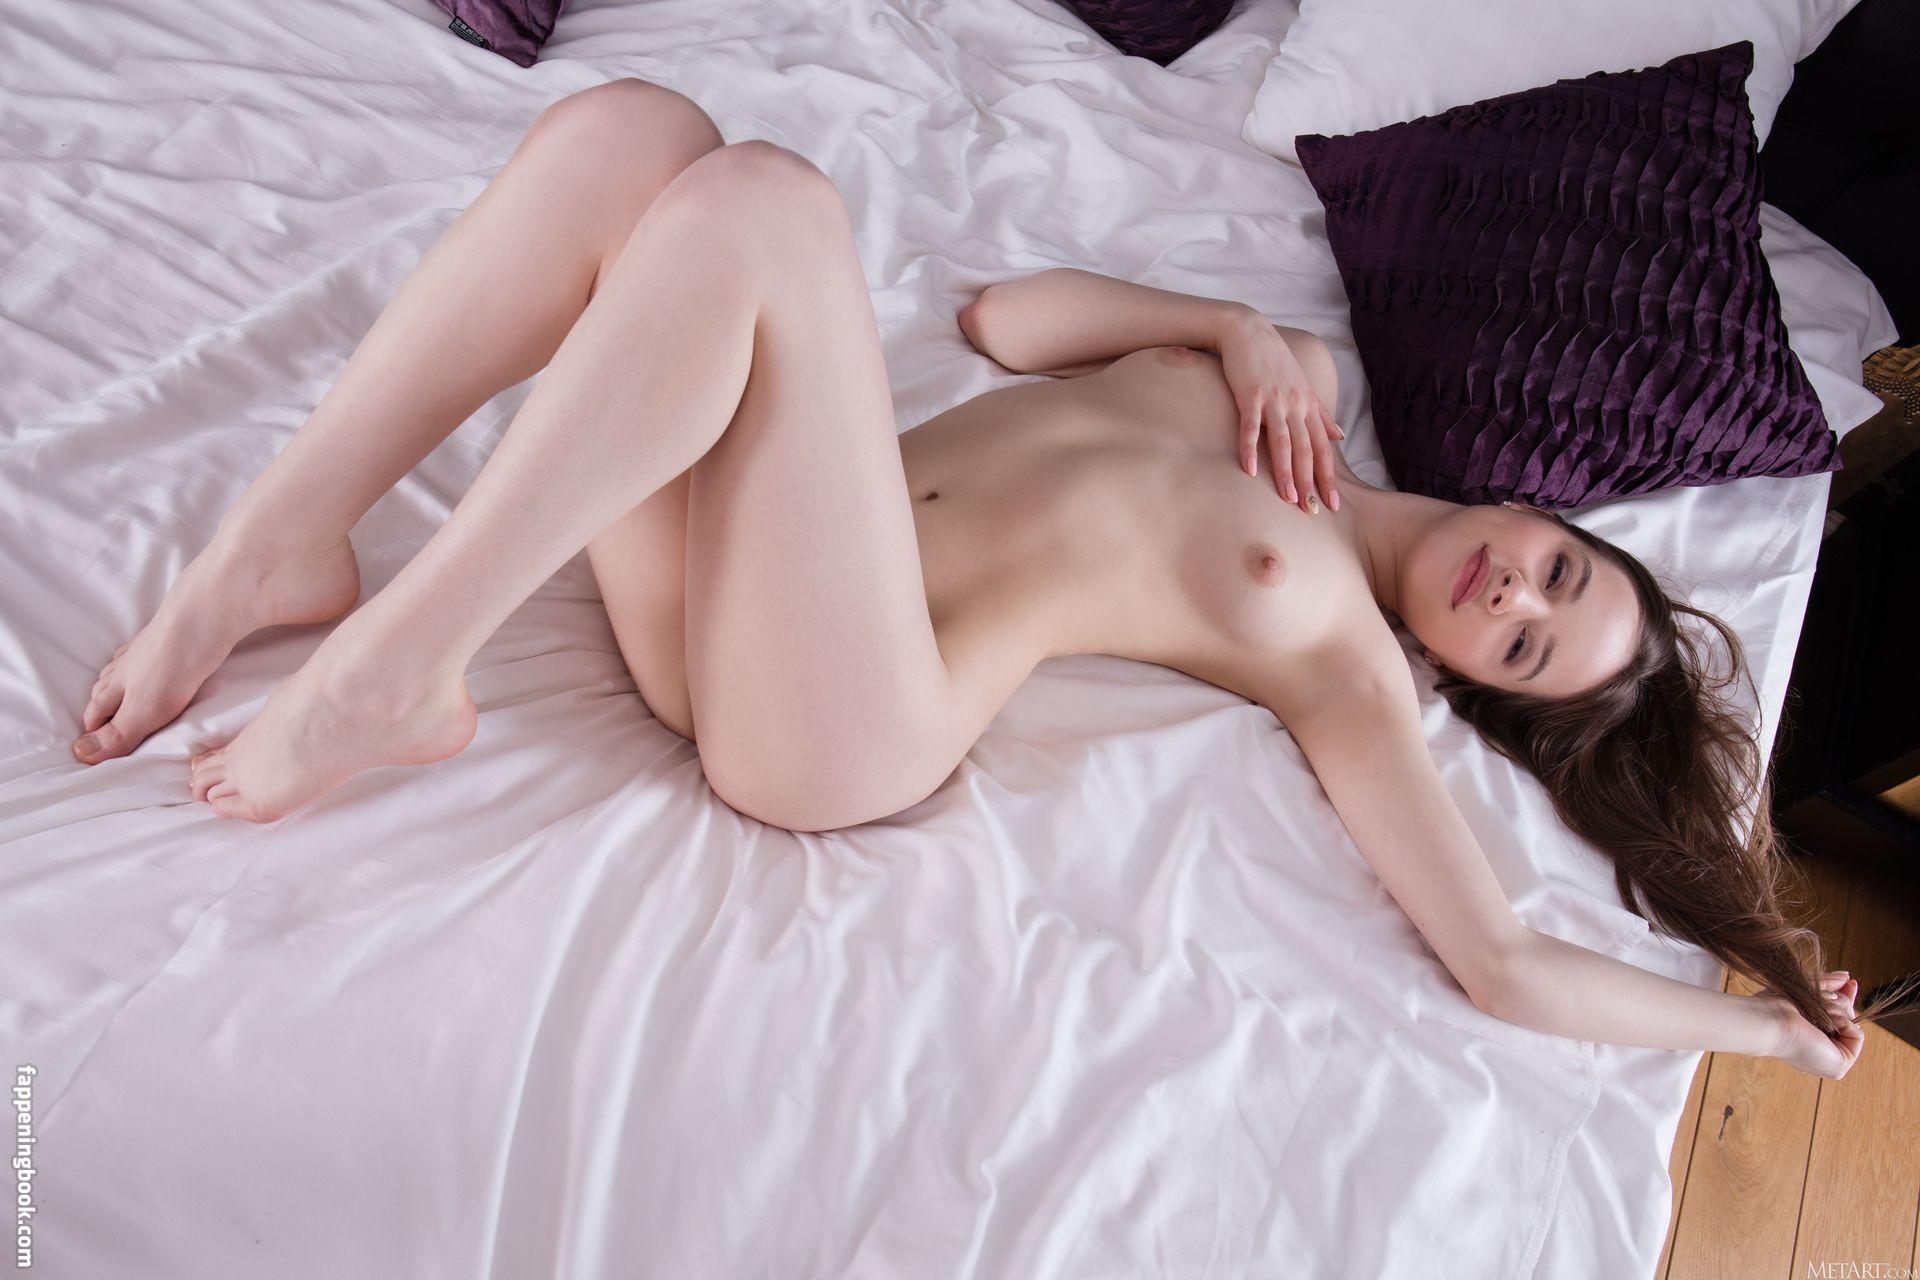 Sabrina Young